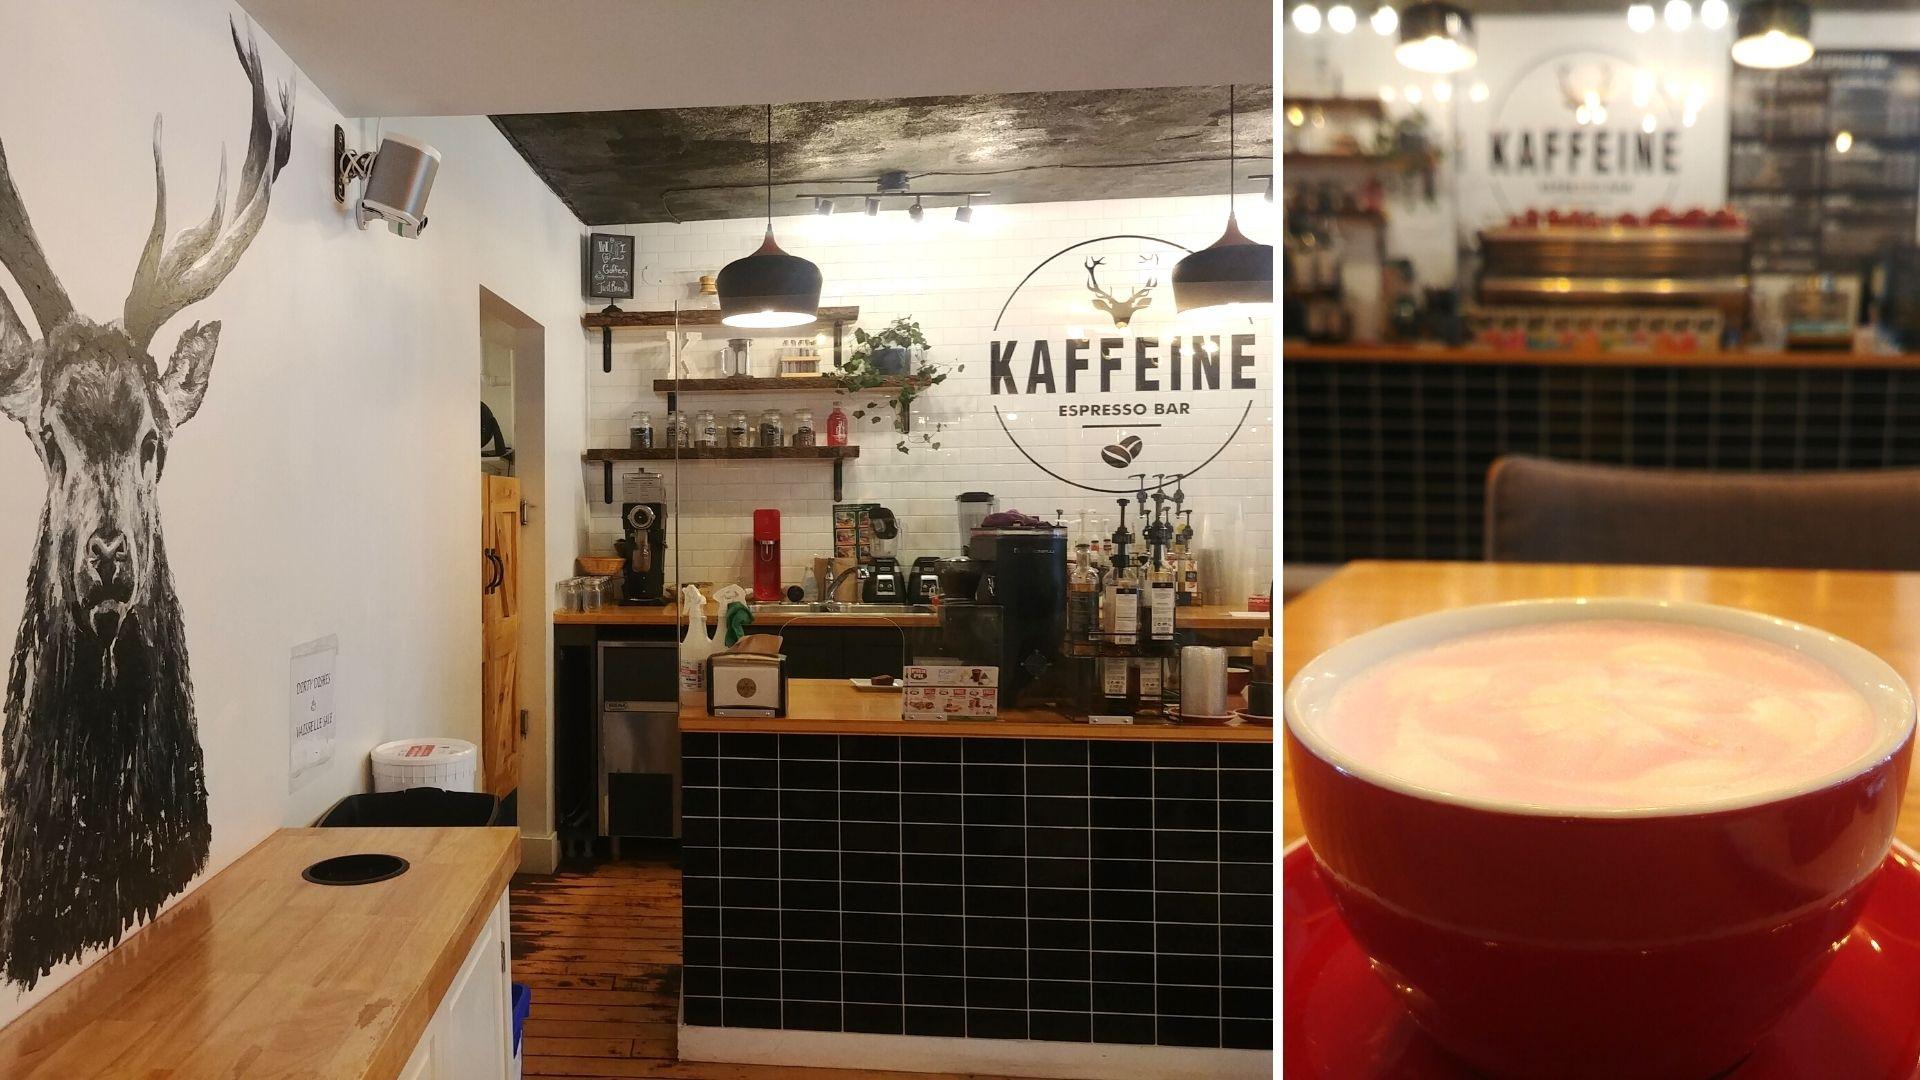 Café Bathurst Kaffeine - Nouveau-Brunswick, Canada